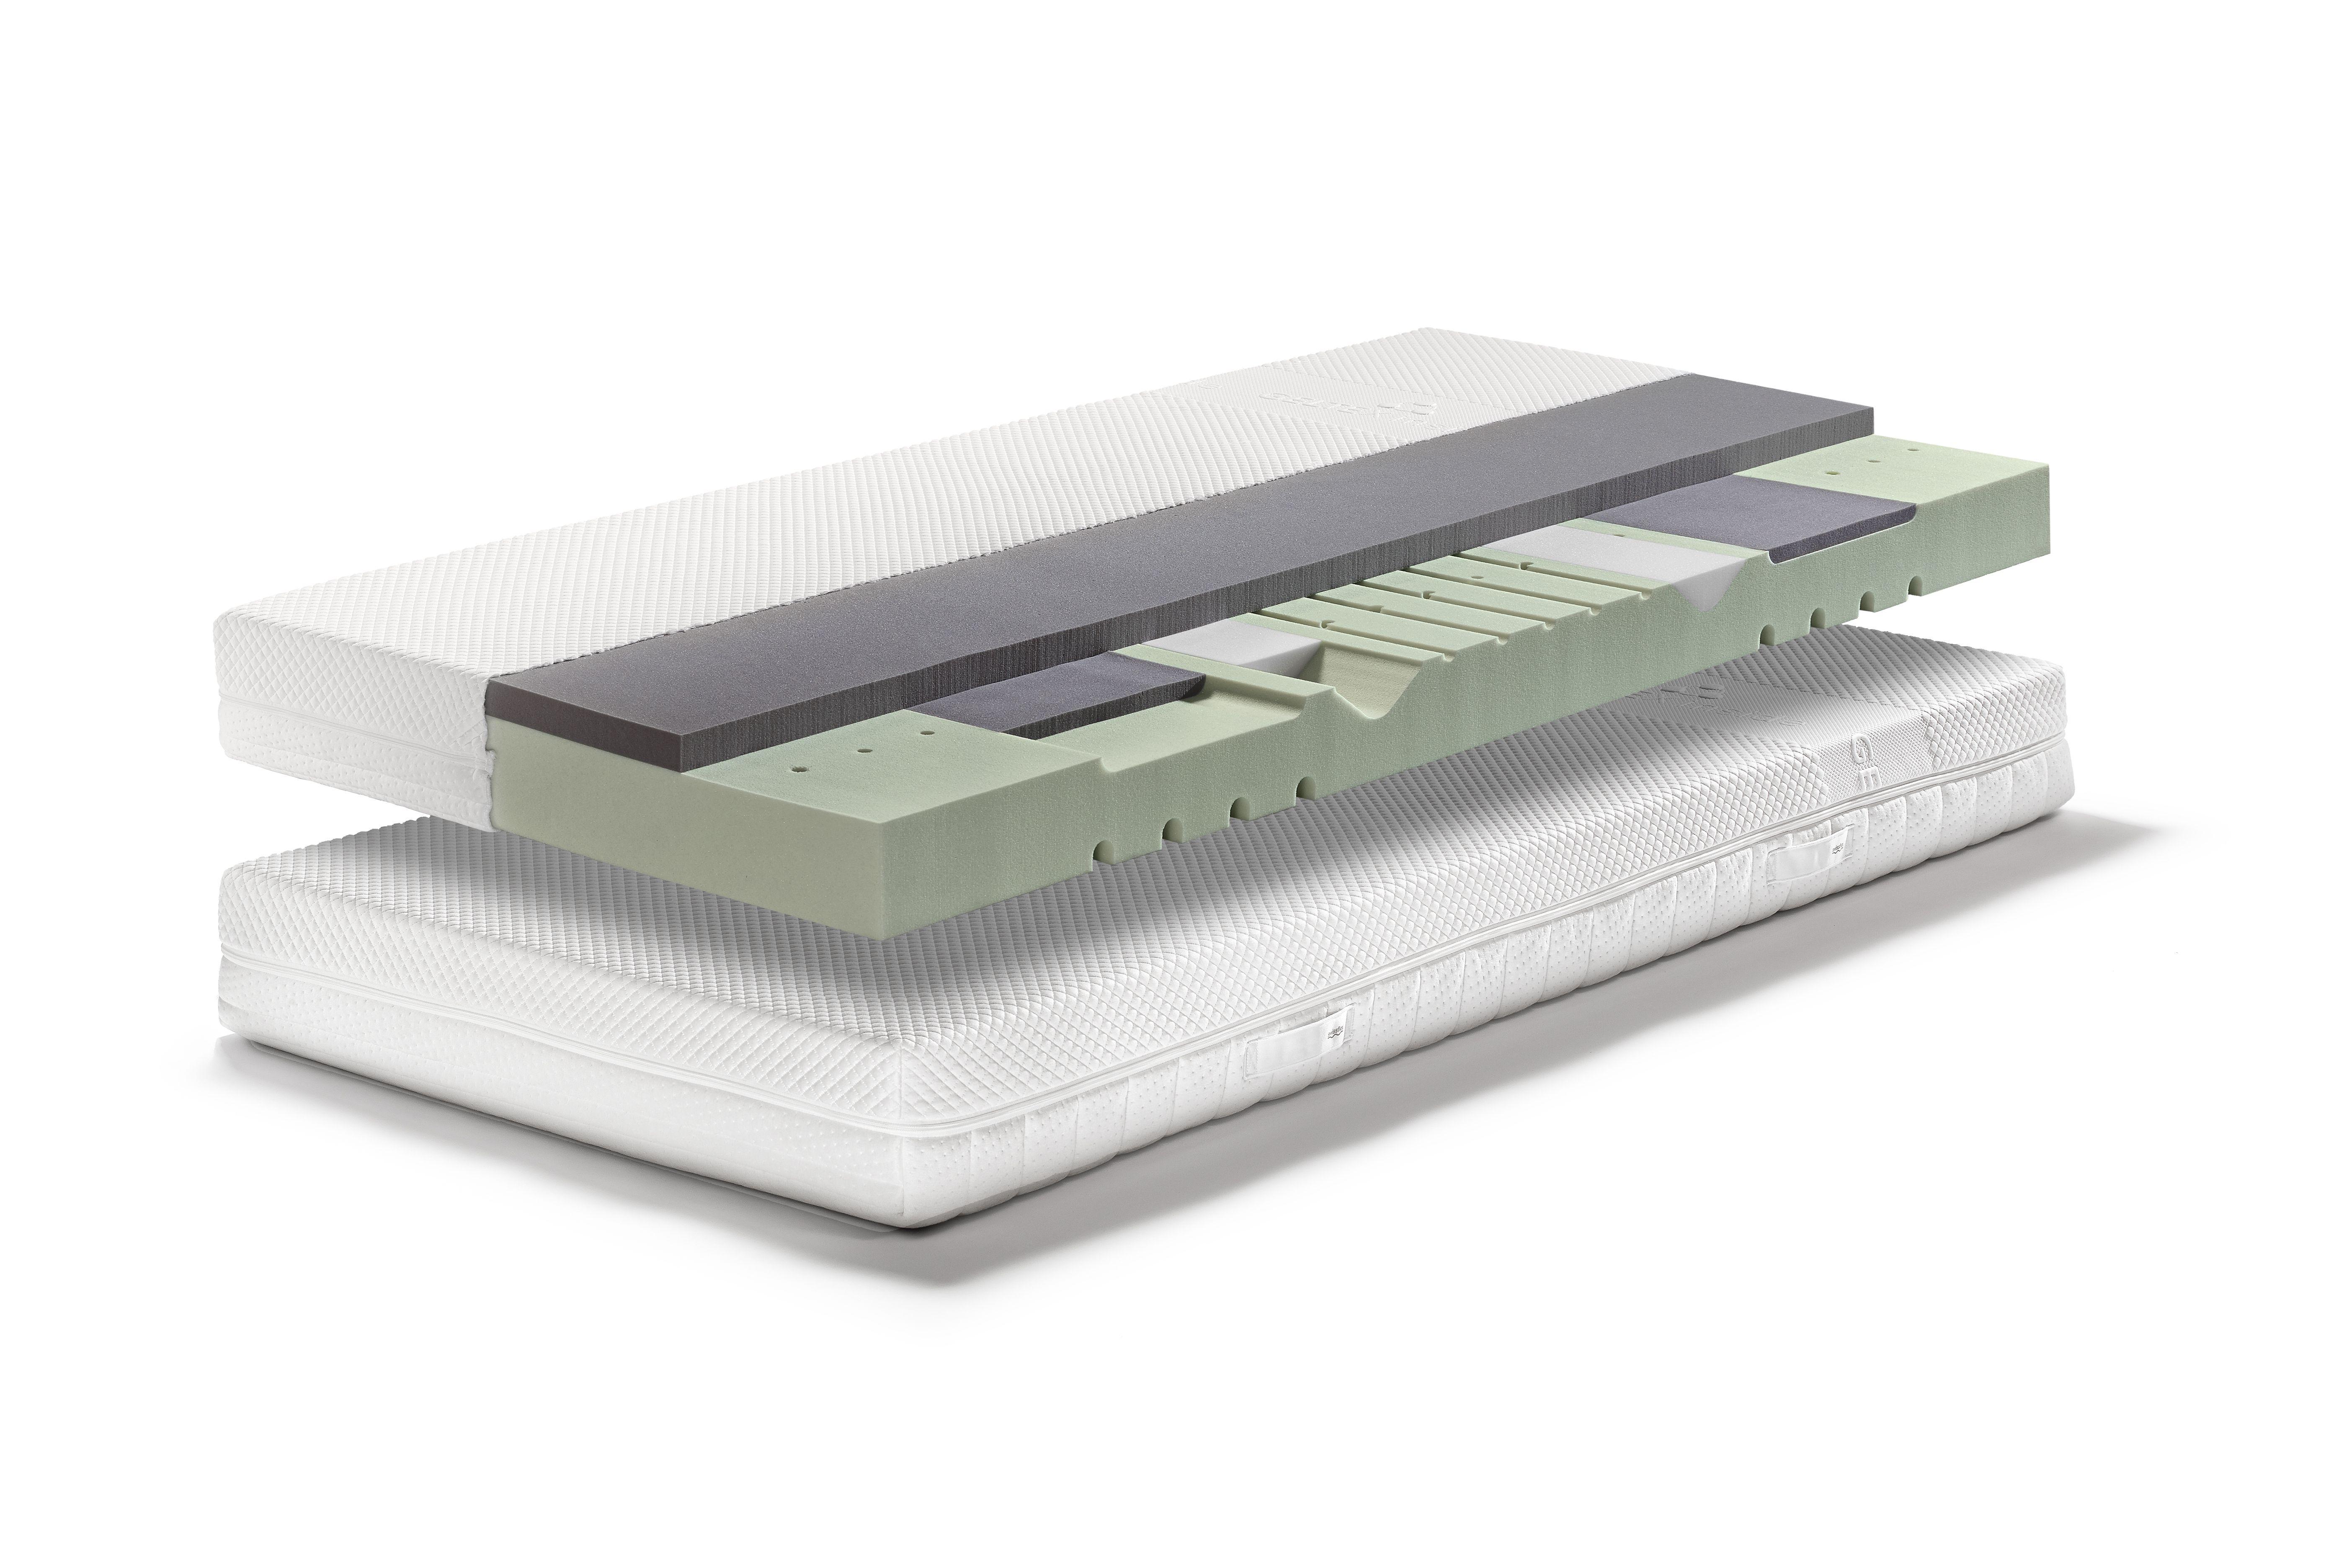 swissflex matras kopen ventilerende matrassen slaaphof. Black Bedroom Furniture Sets. Home Design Ideas